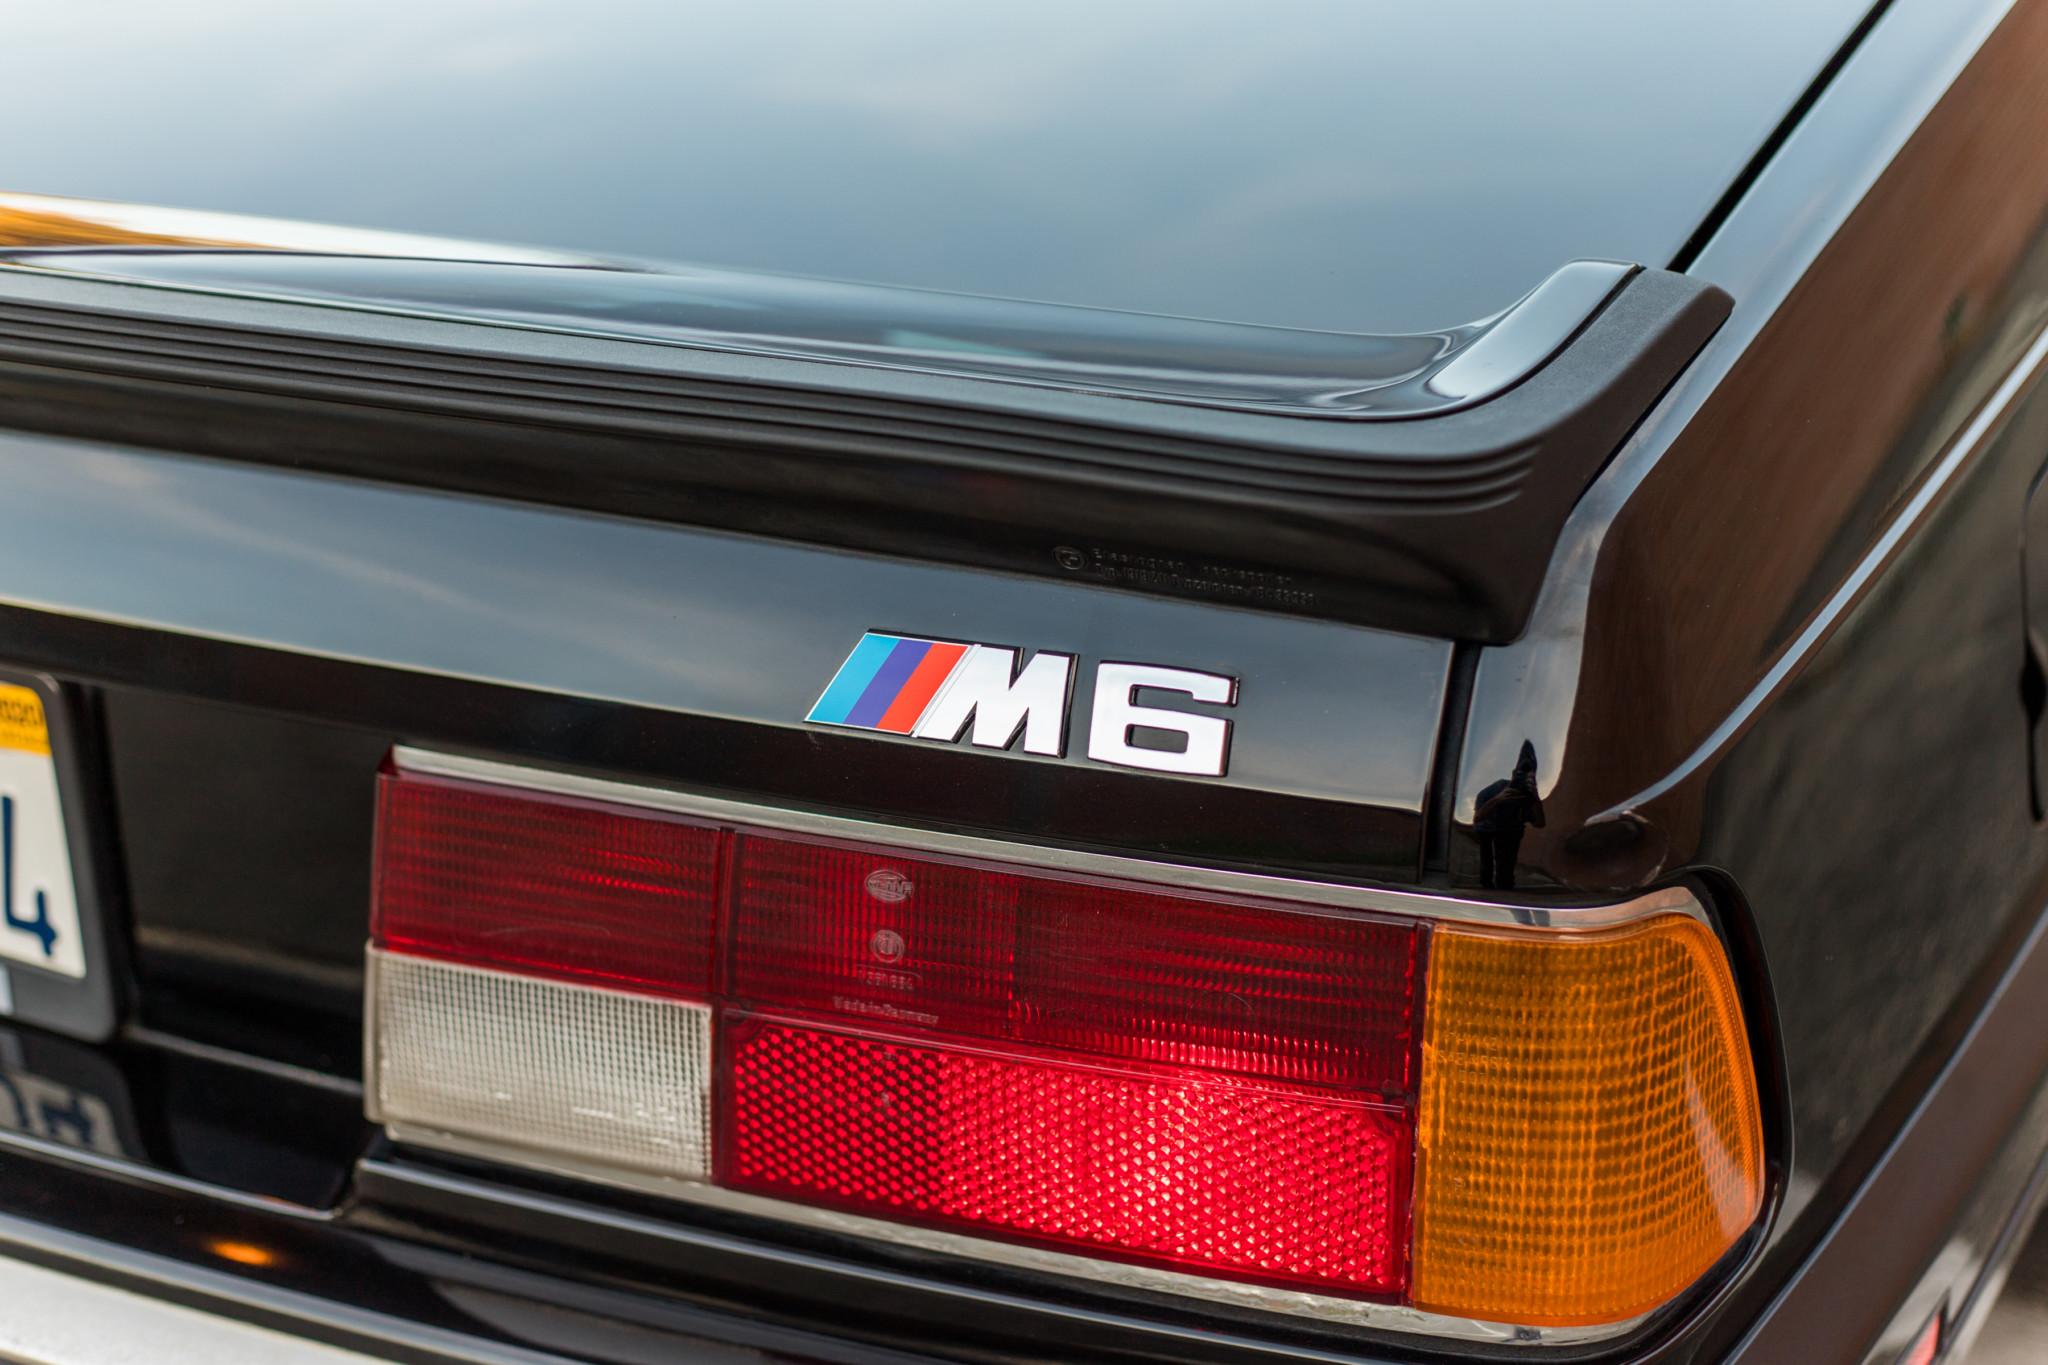 1988 bmw M6 kent classic cars (25).jpg